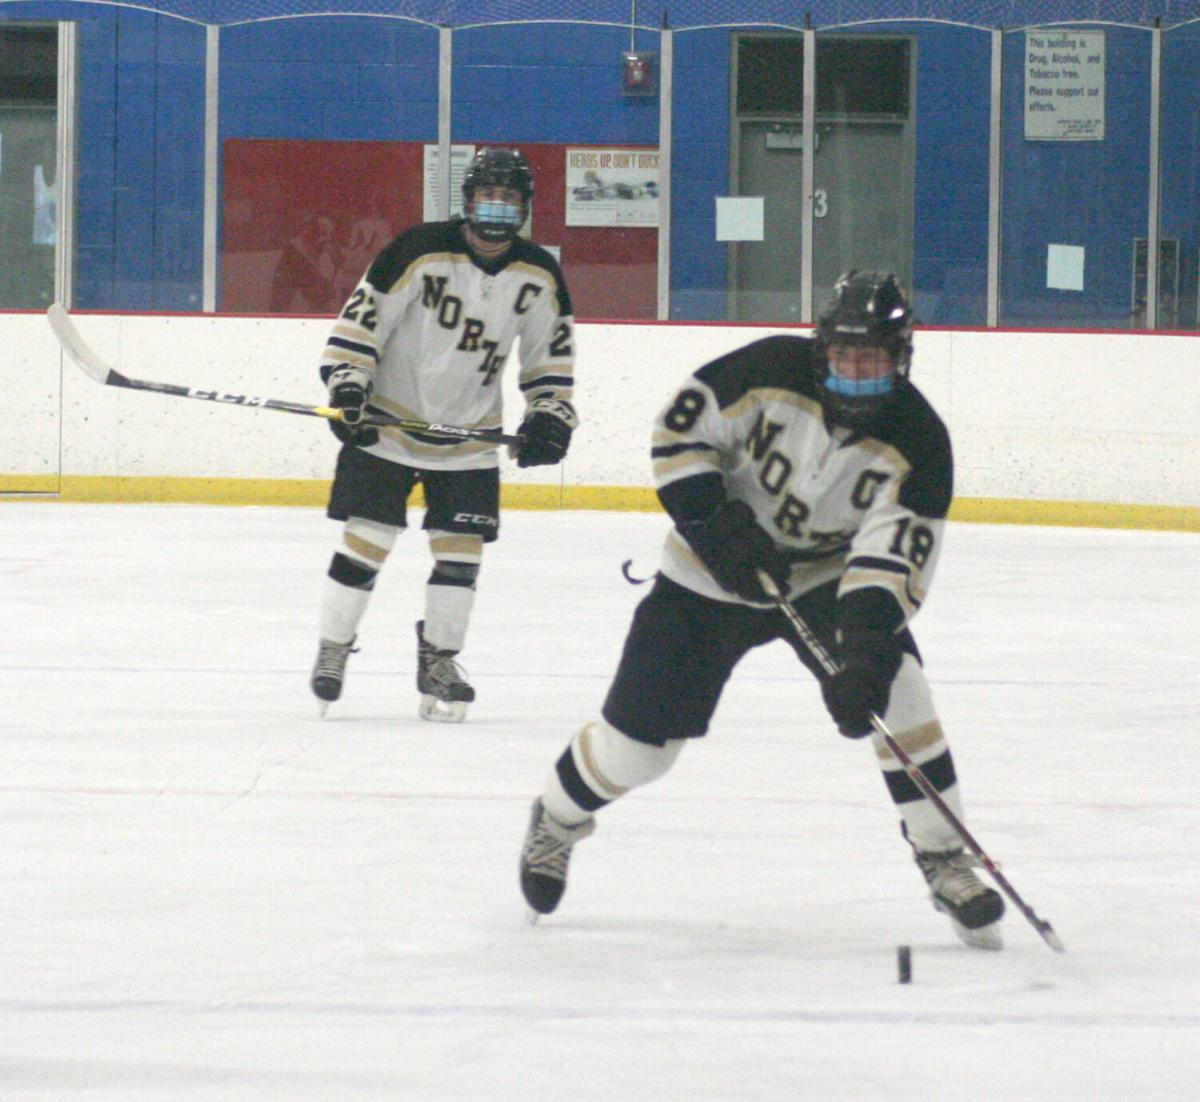 210218ind NK-SK Hockey 3.jpg